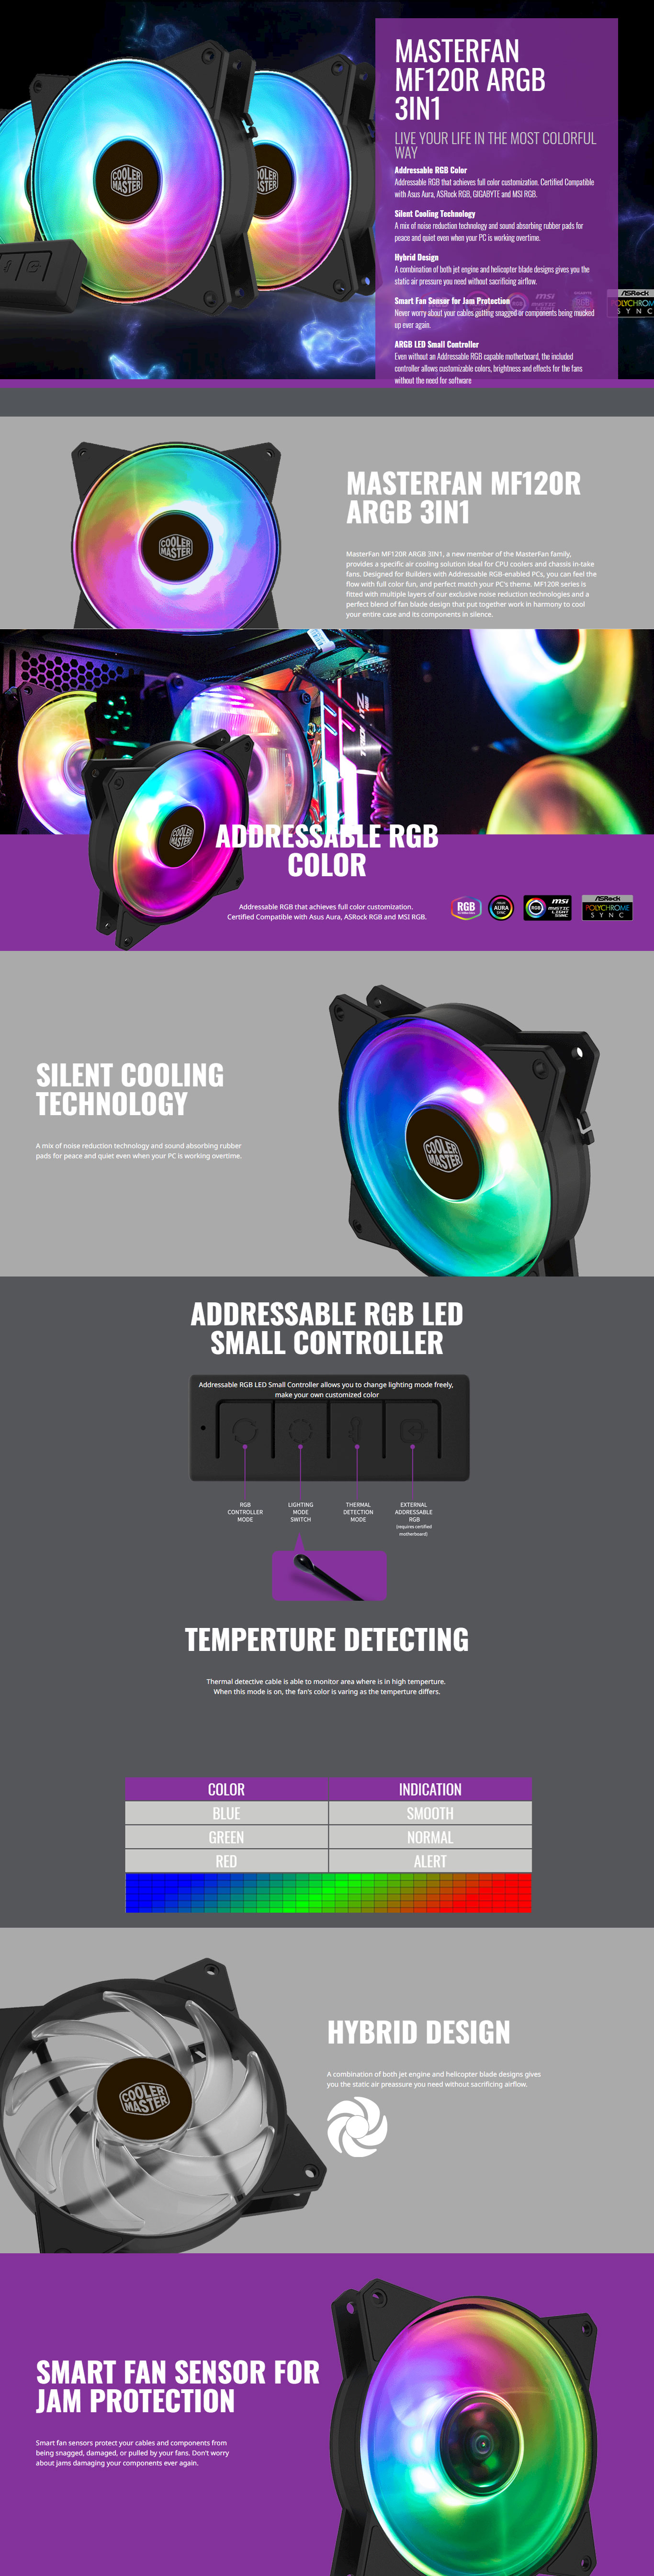 Cooler MasterFan MF120R ARGB 3in1 CPU Air Cooler (R4-120R-203C-R1)